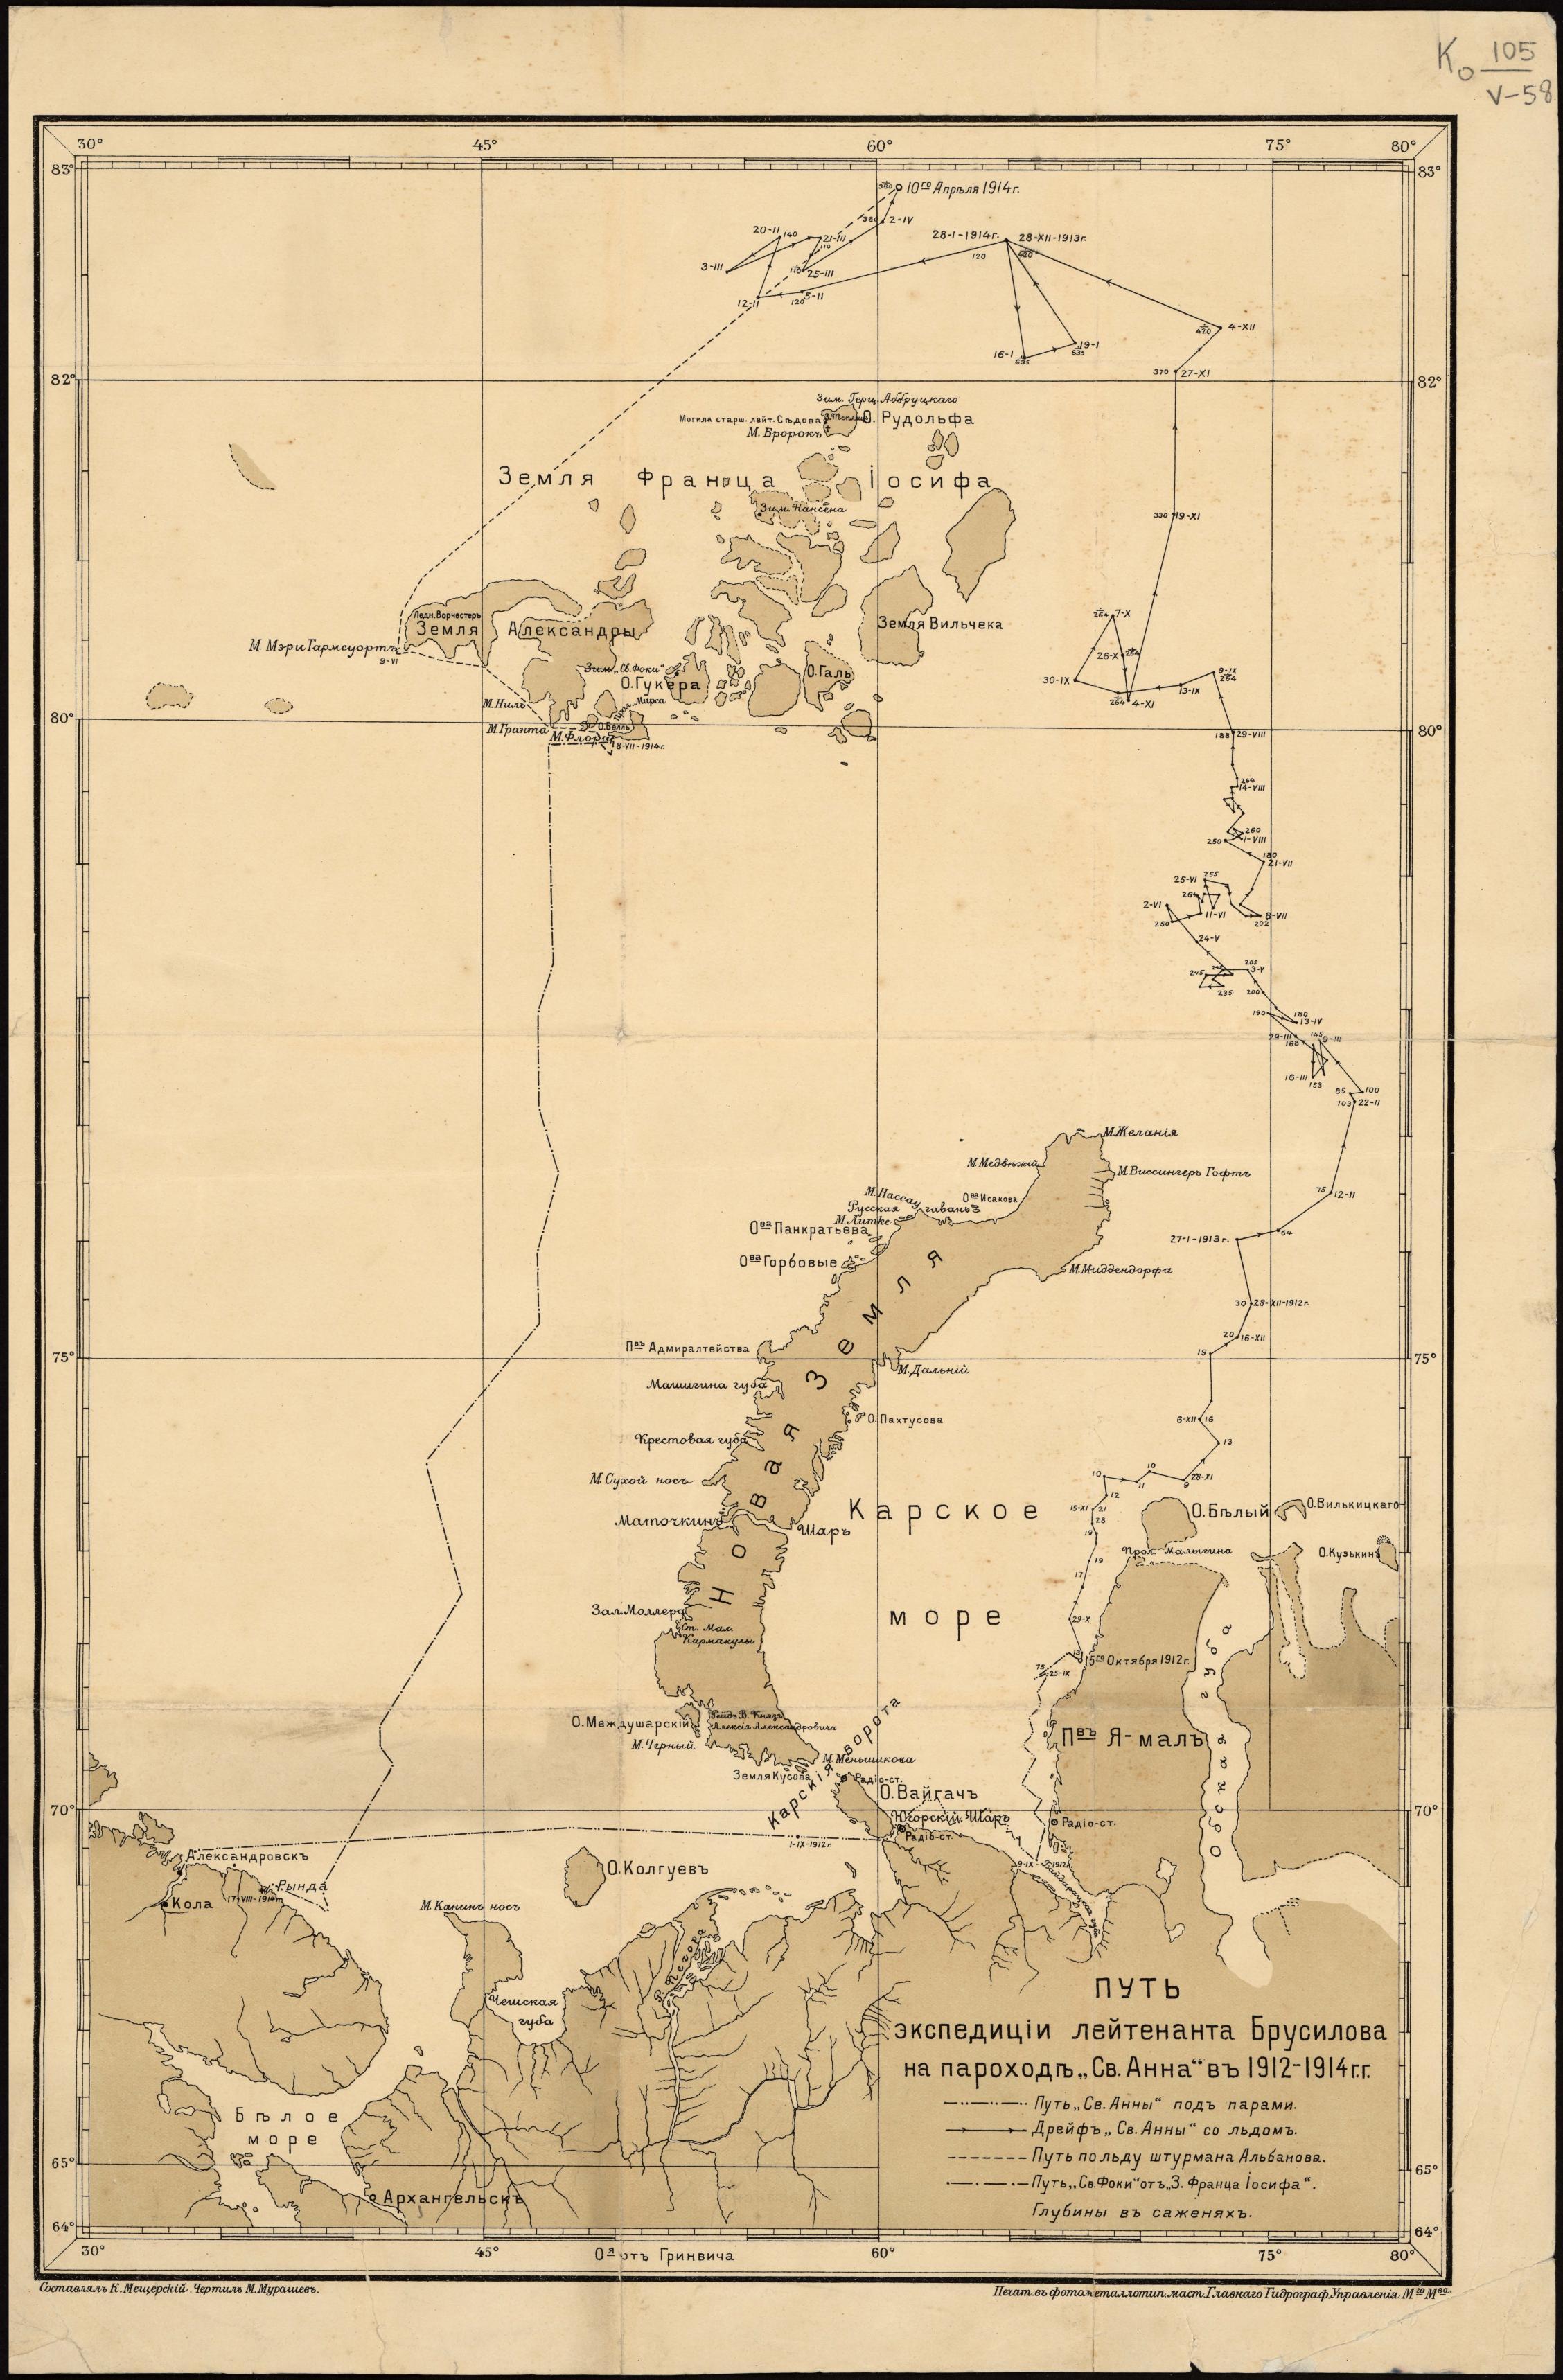 1912 - 1914. Путь экспедиции лейтенанта Брусилова на пароходе Св. Анна